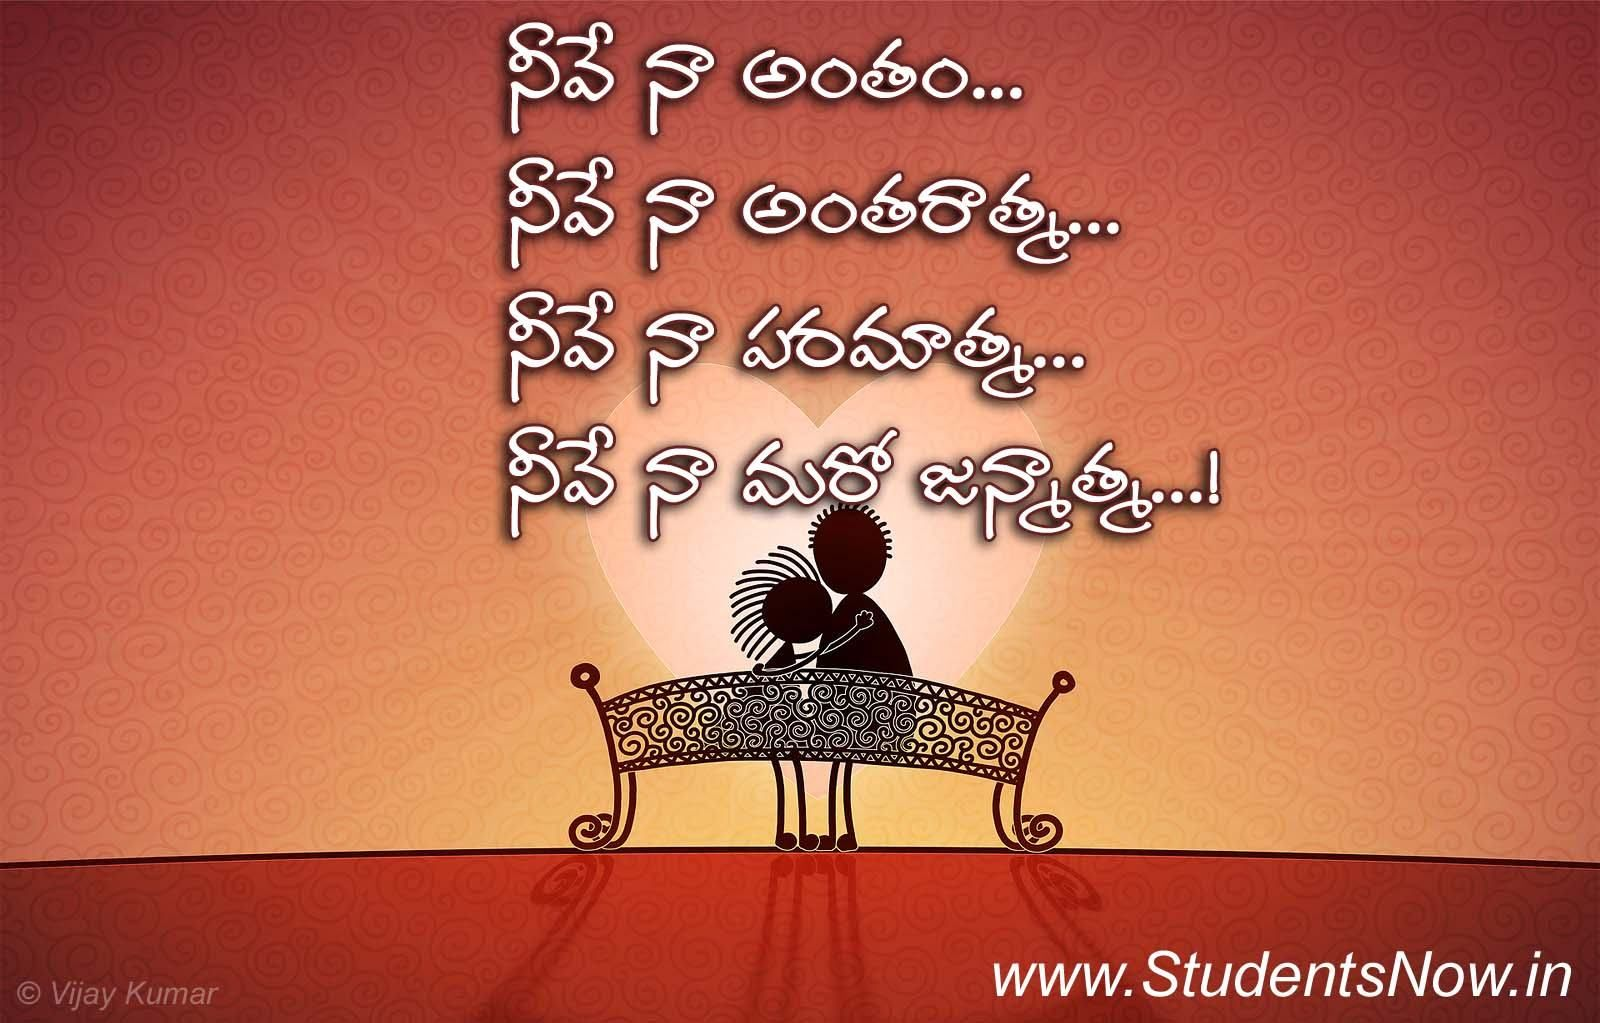 Great Wallpaper Love Telugu - 18e217f2d4da6900444ea82e120d2f9d  Pictures_621583.jpg